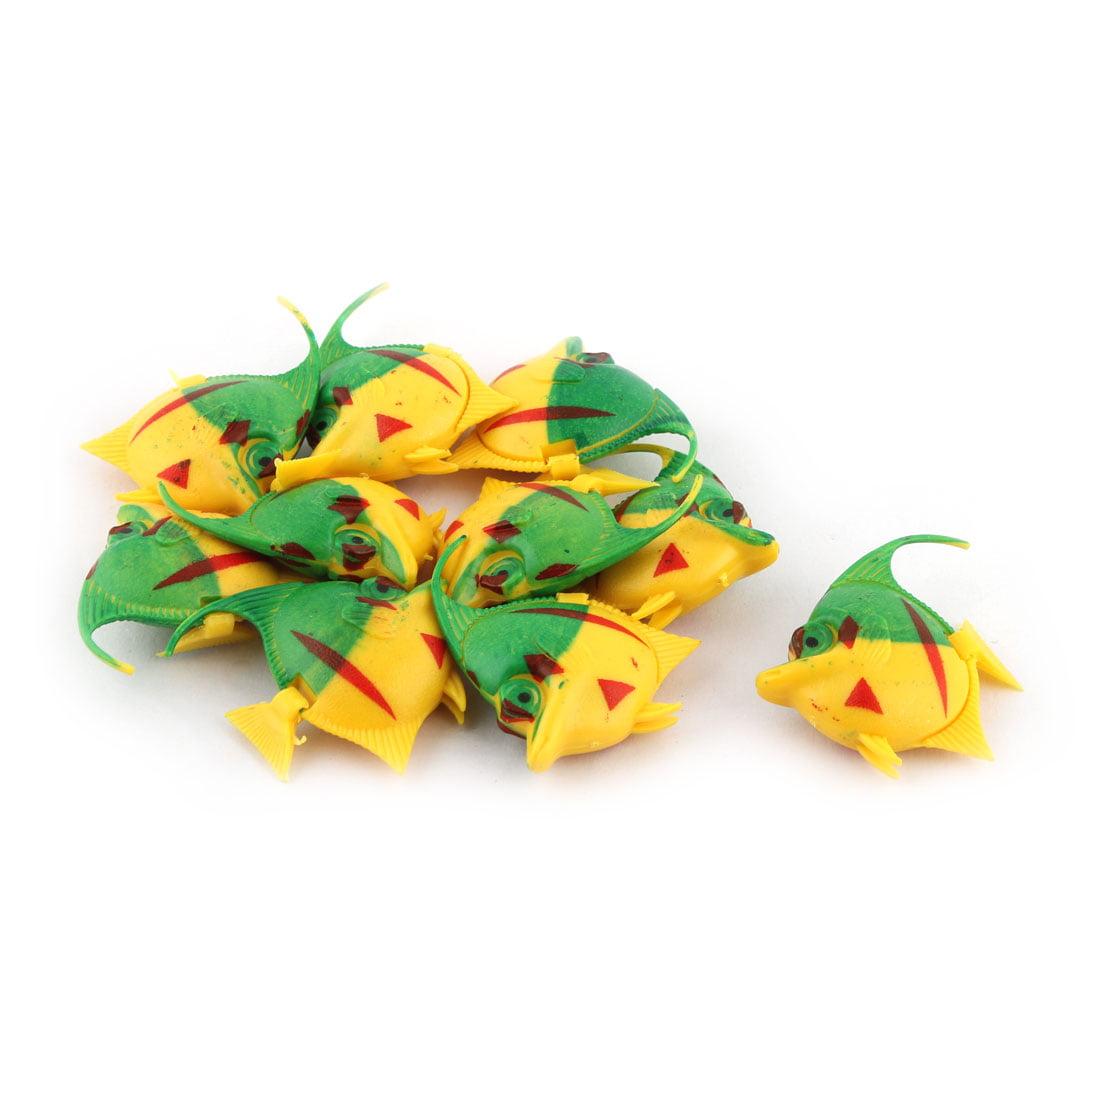 Aquarium Simulated Floating Plastic Fish Decoration Ornament Green Yellow 10 PCS